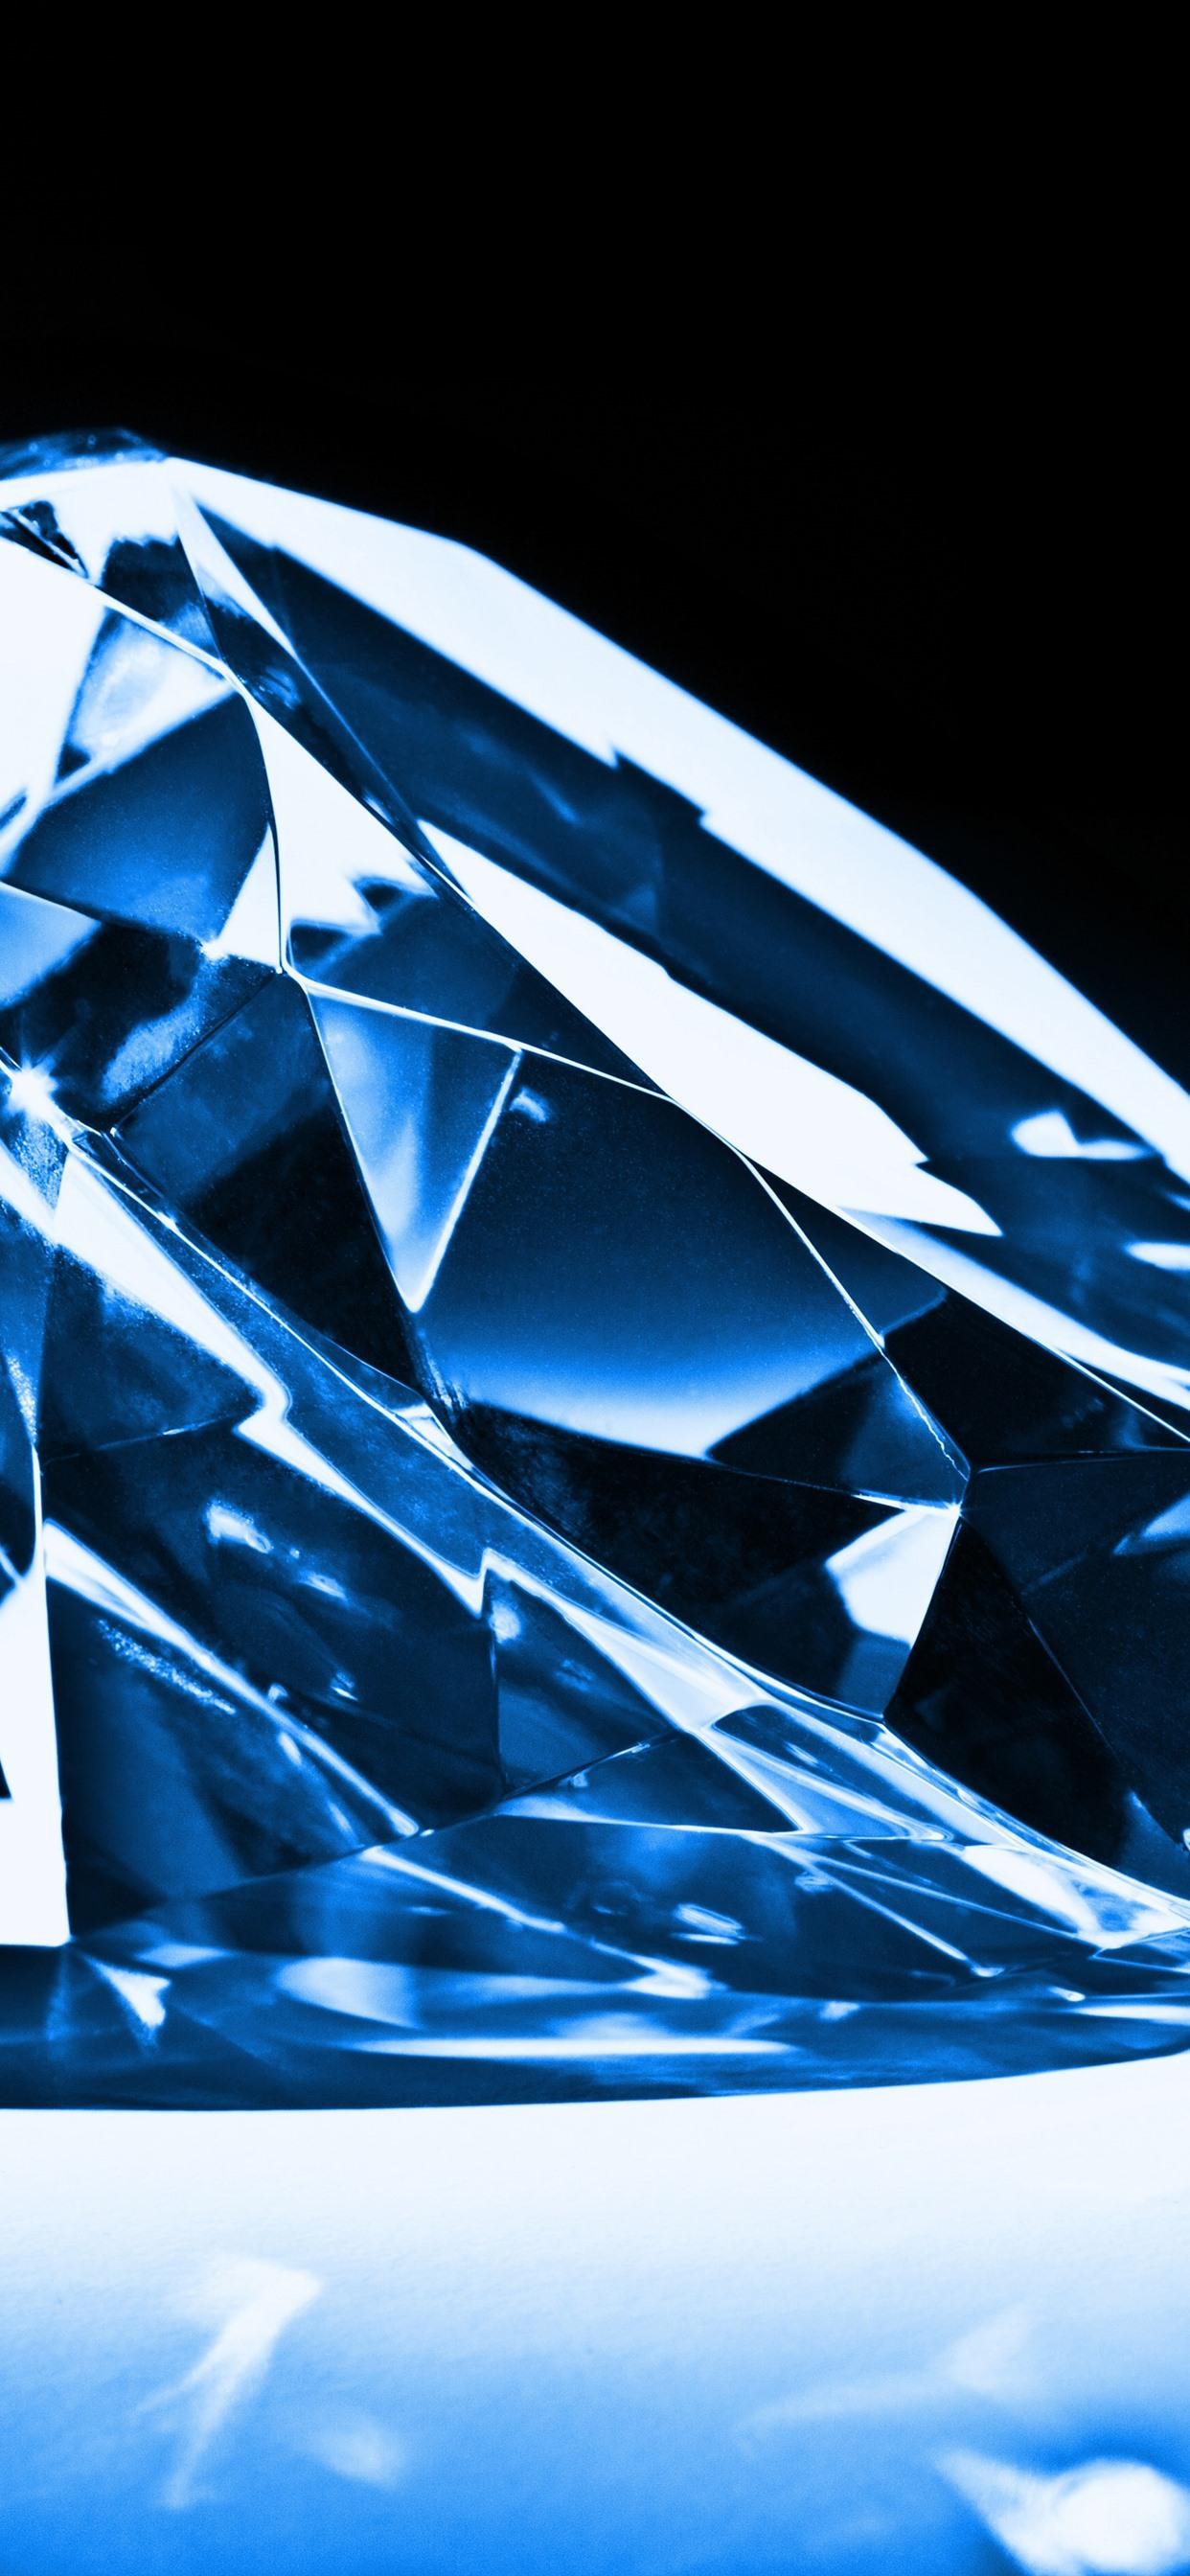 Diamond Light Shadow 1242x2688 Iphone Xs Max Wallpaper